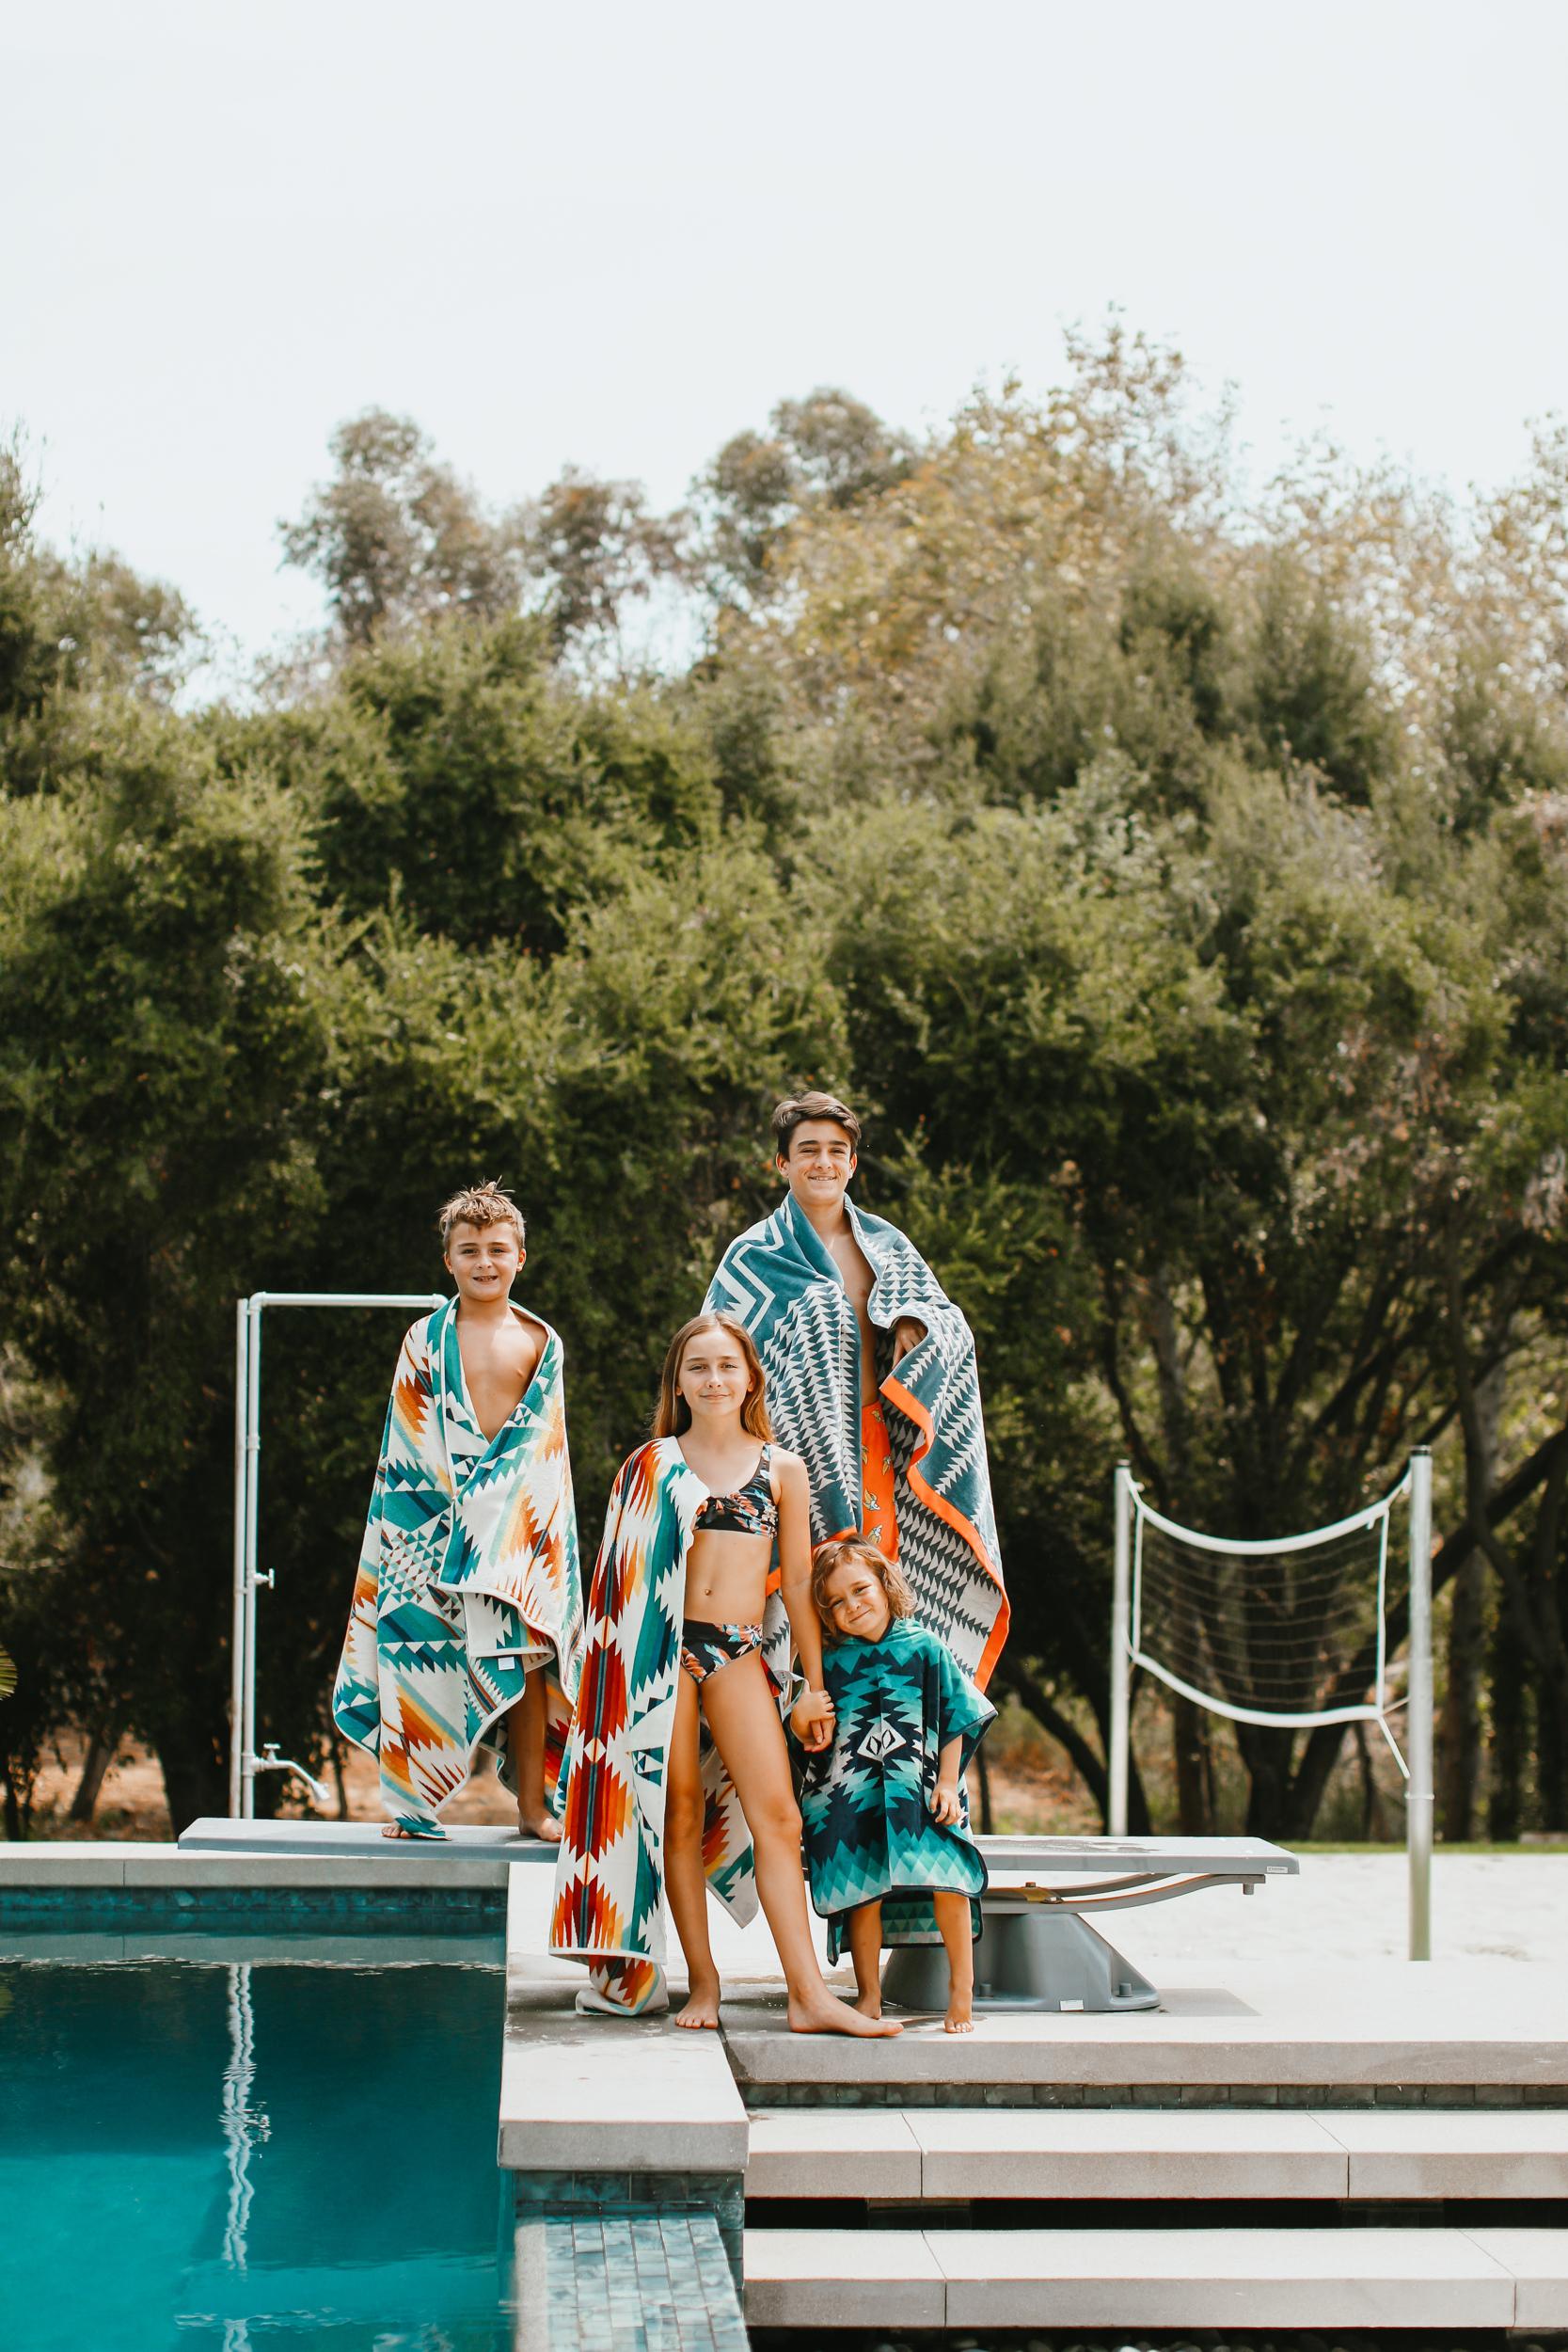 kids standing around the pool